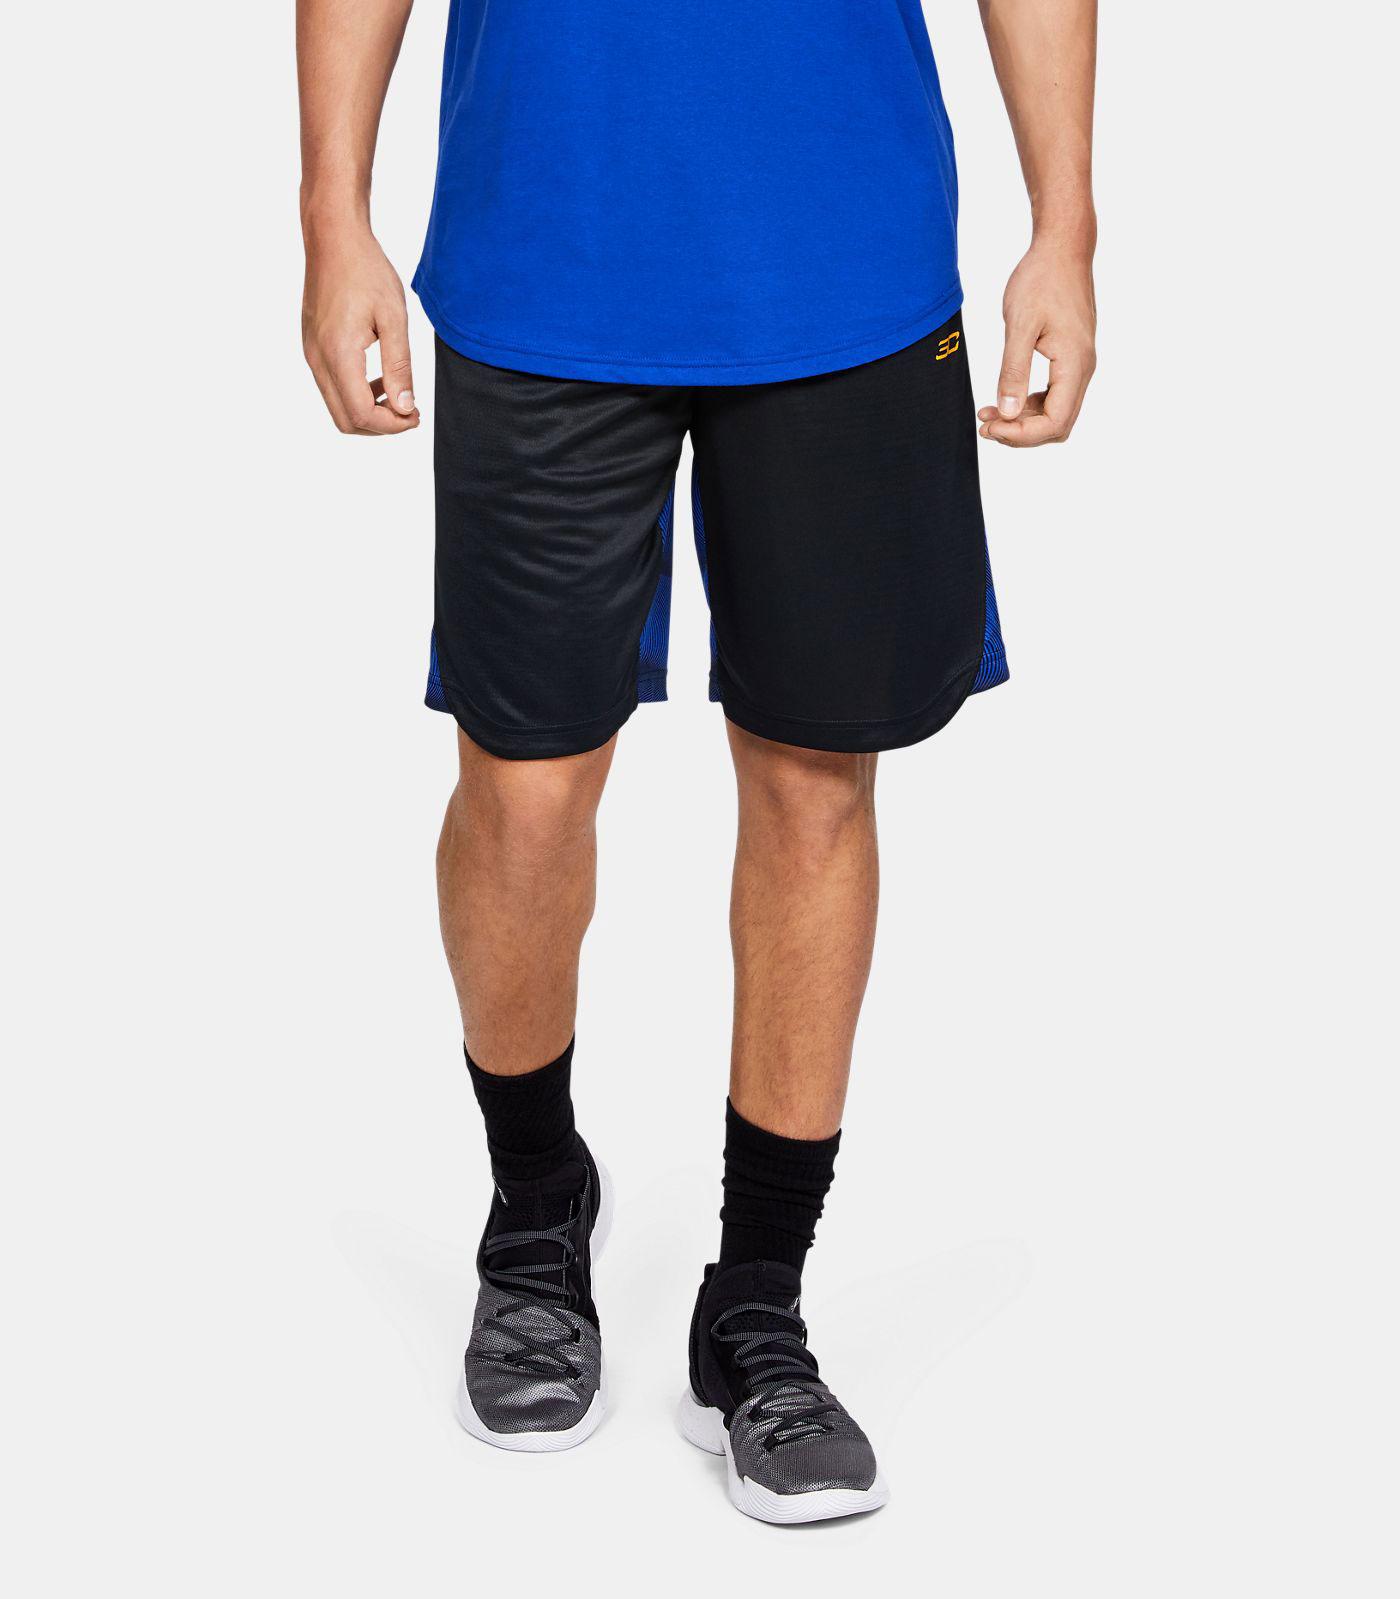 curry-7-dub-nation-shorts-1